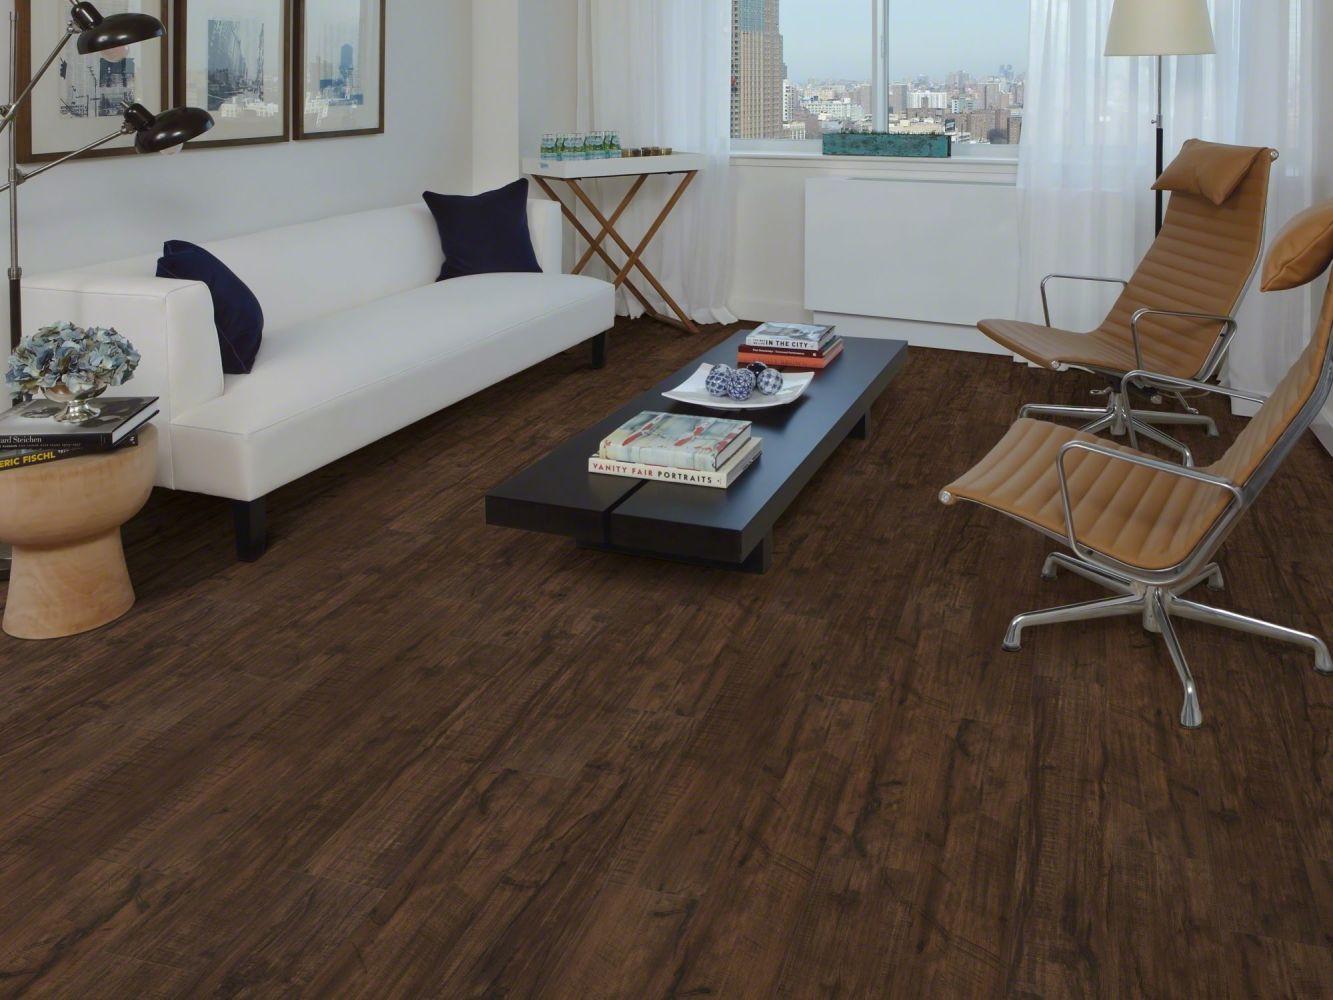 Shaw Floors Resilient Residential Piancavallo Plus Umber Oak 00734_HSS47